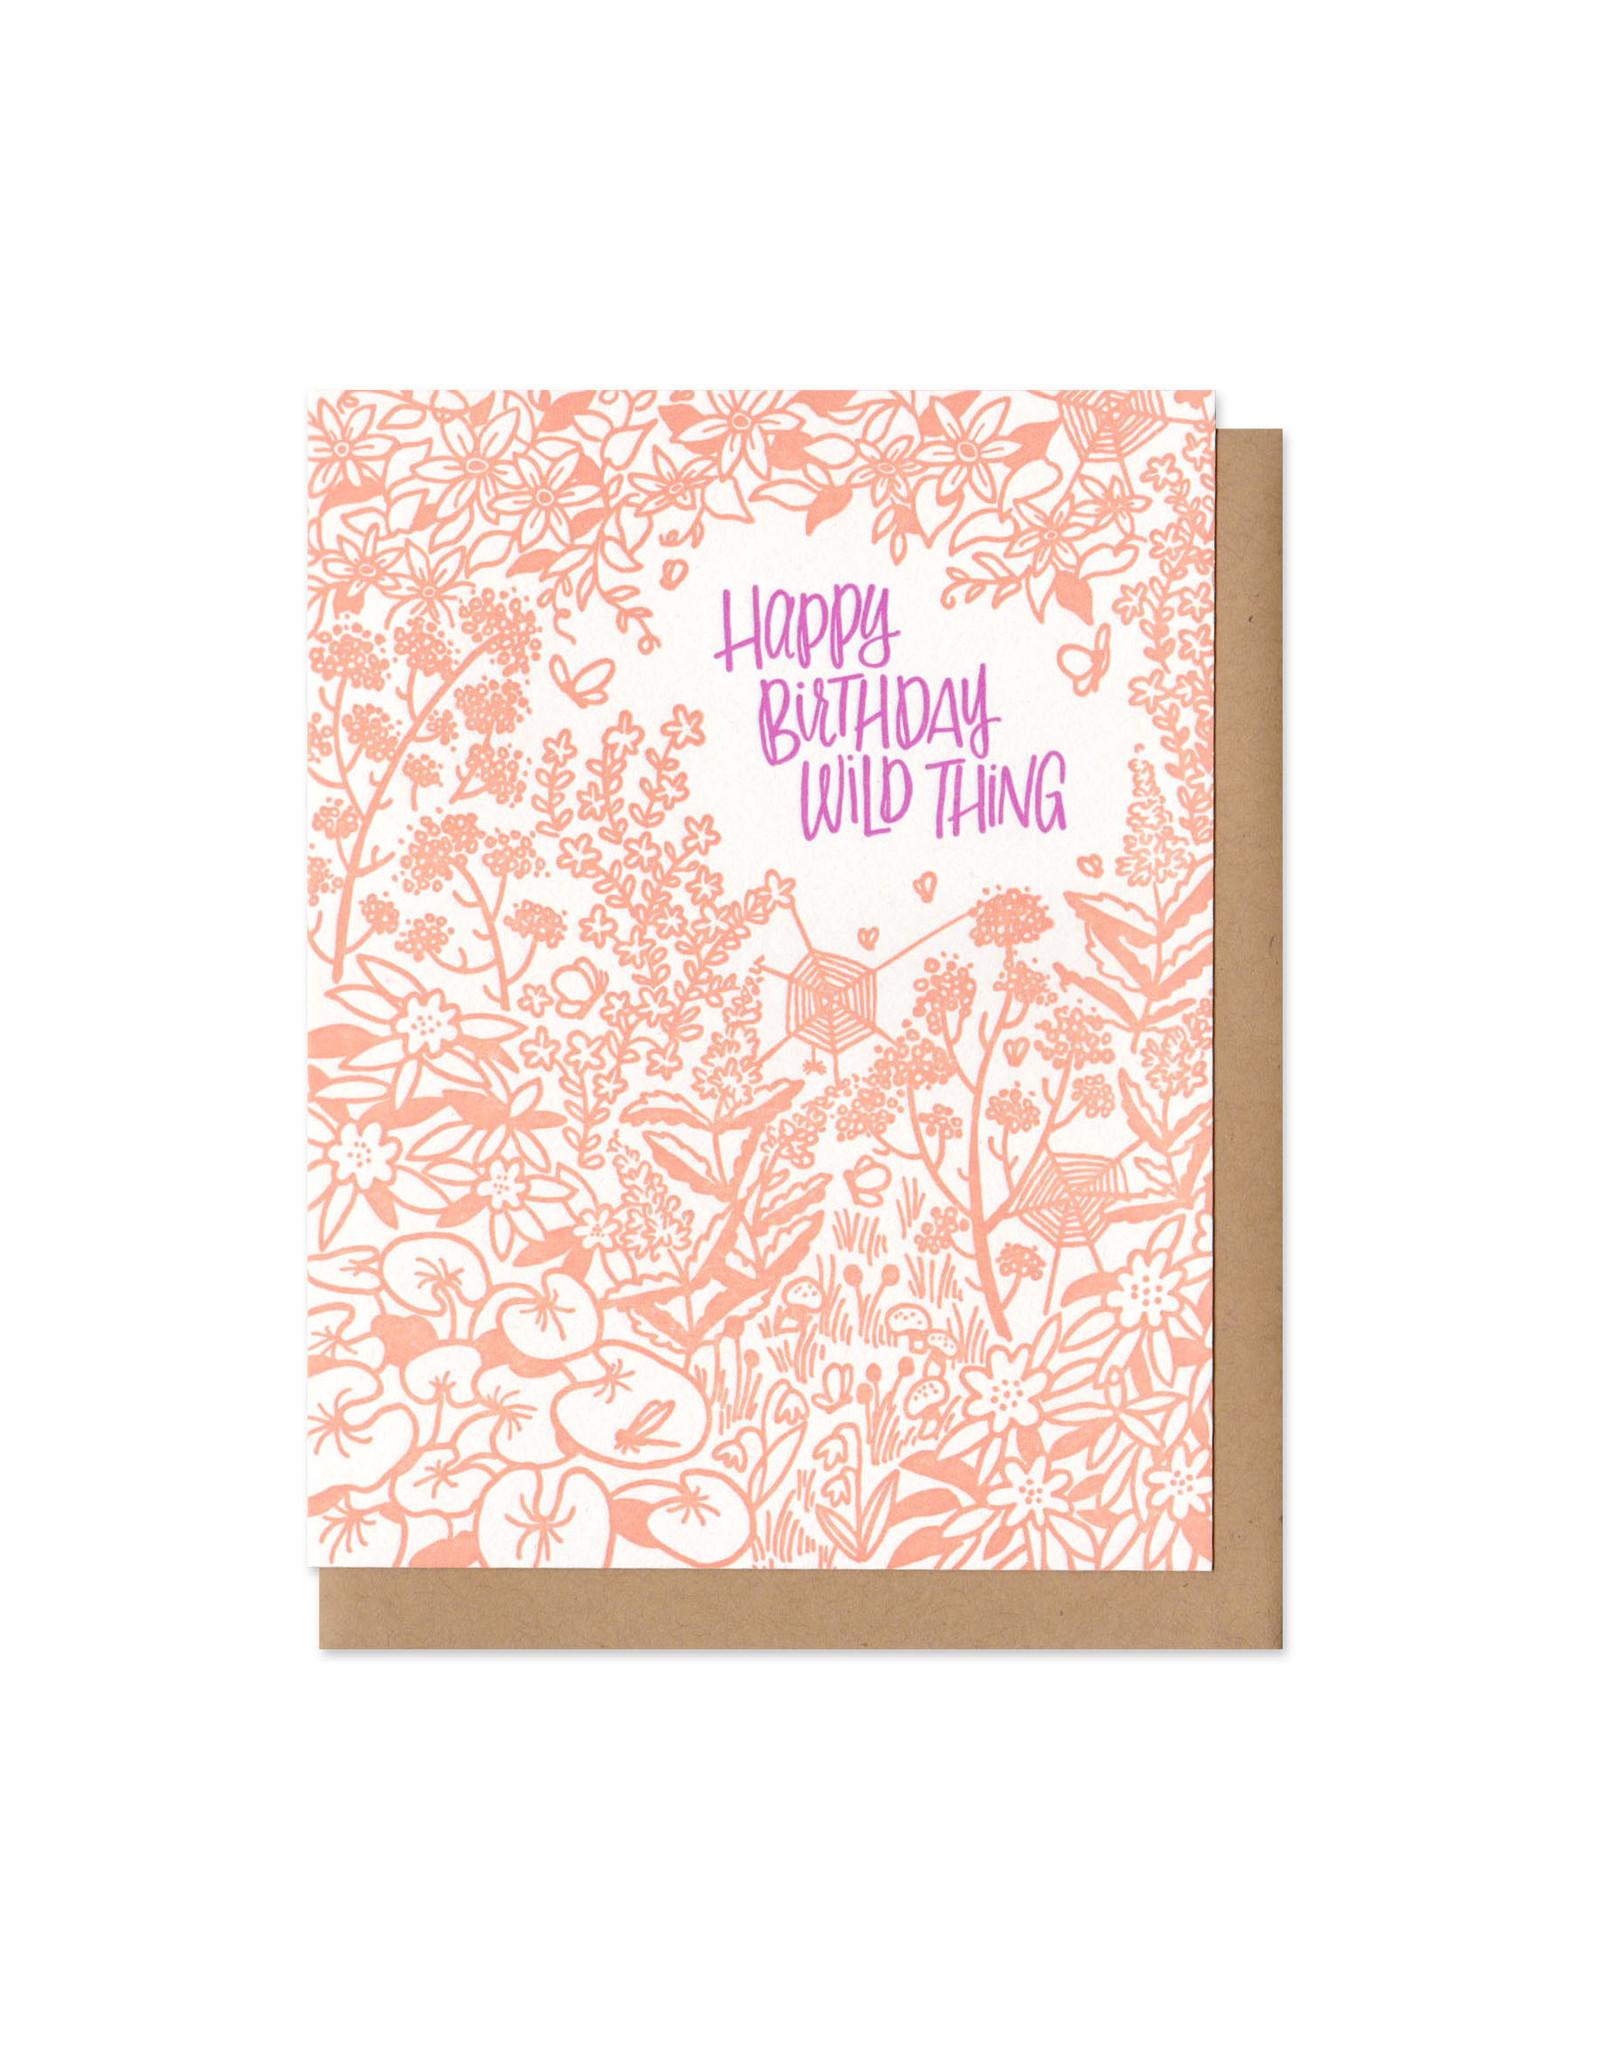 Happy Birthday Wild Thing Greeting Card